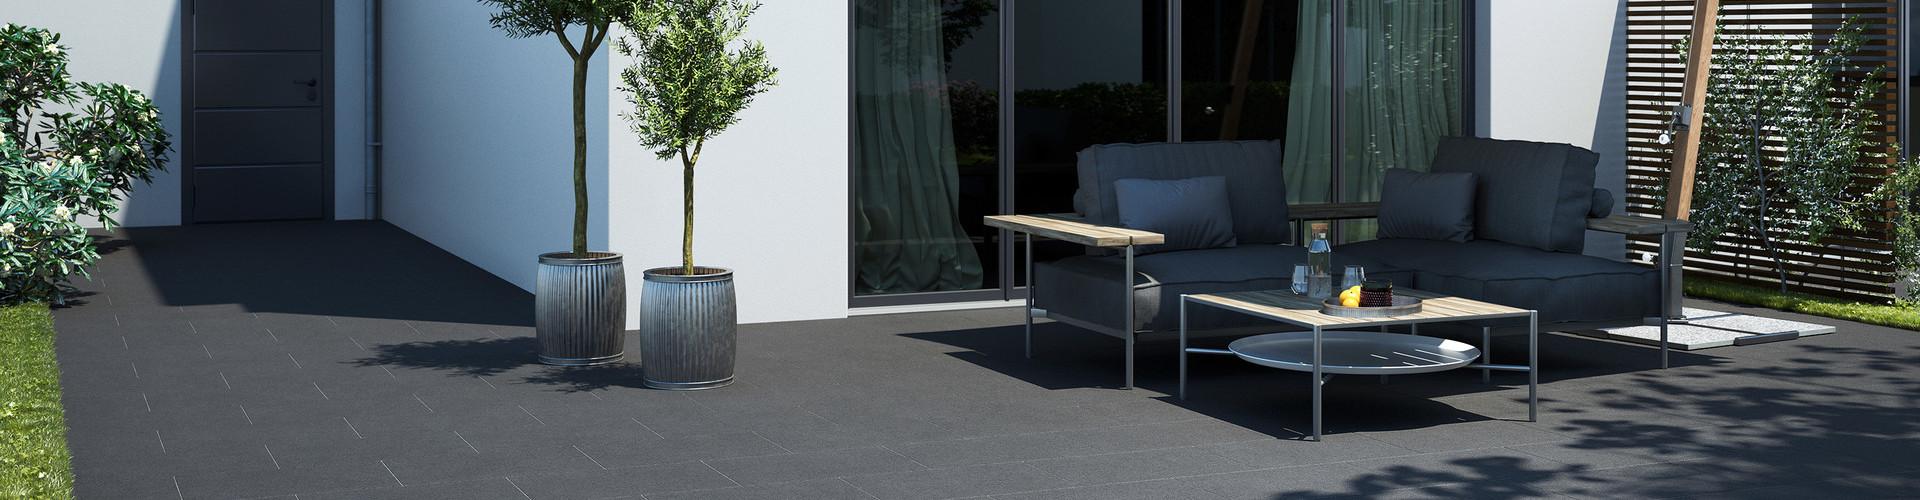 Terrassenplatten anthrazit beschichtet Protect